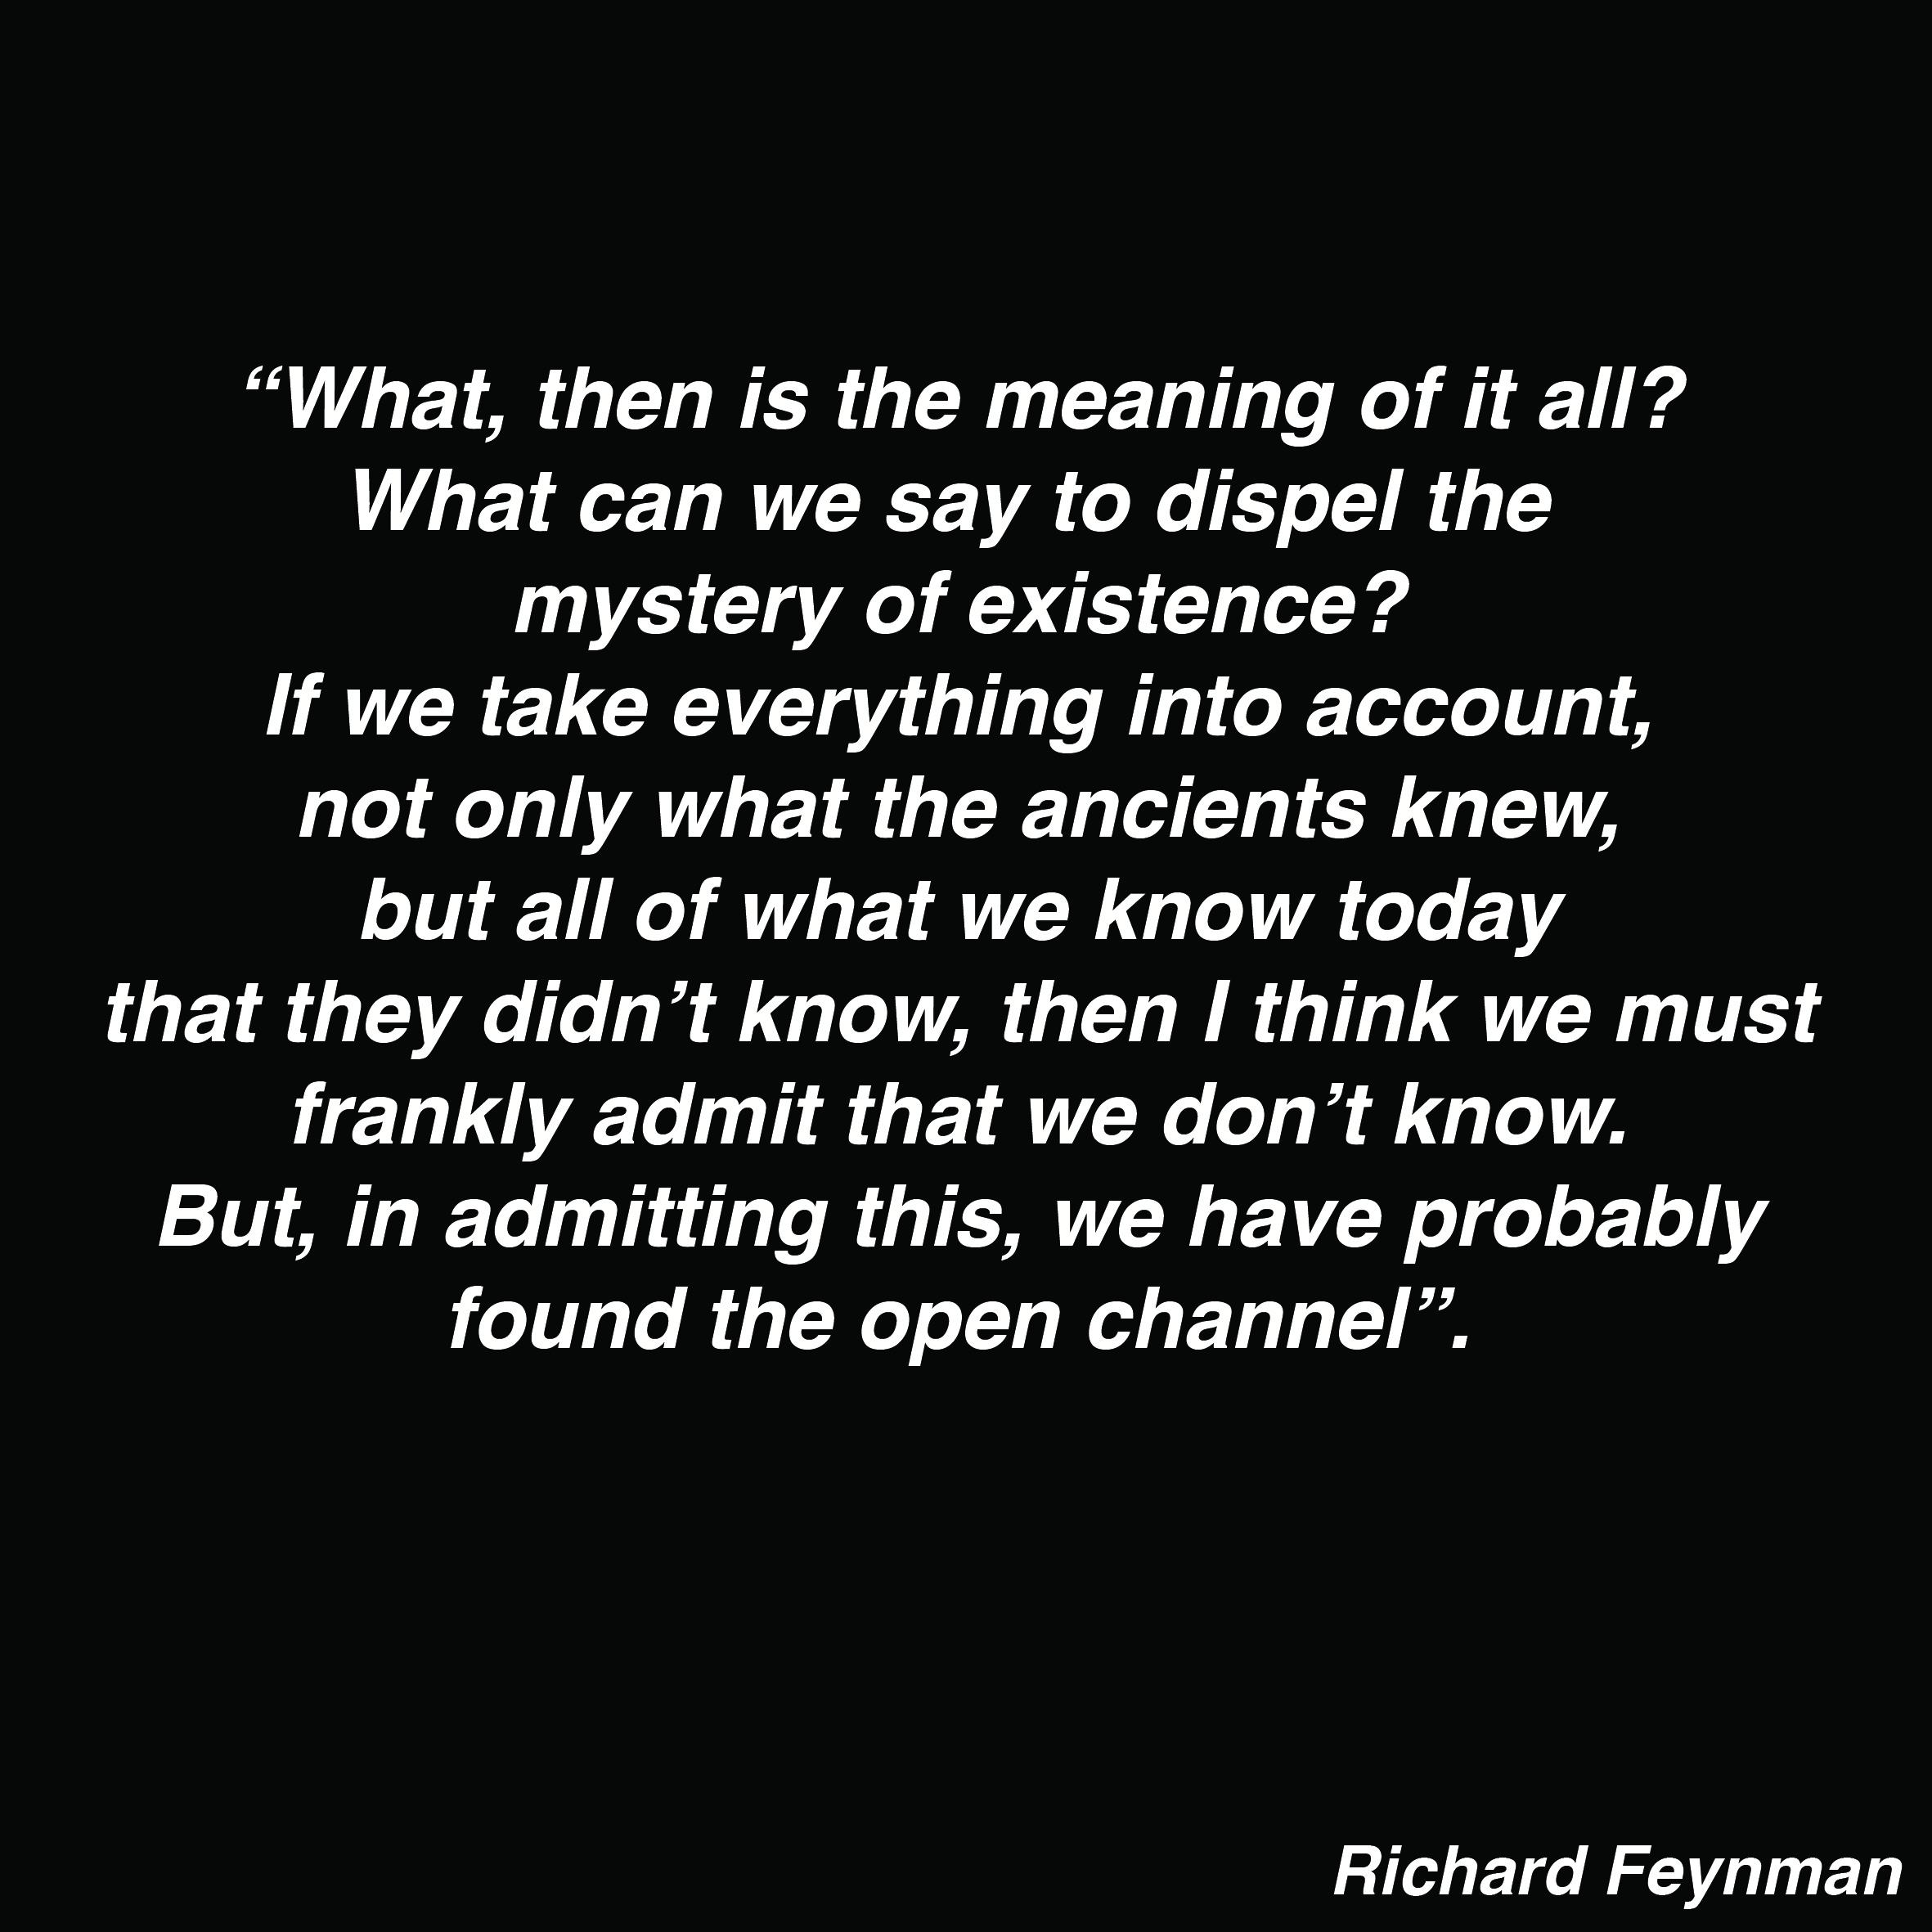 Feynman_quote_1_60_60